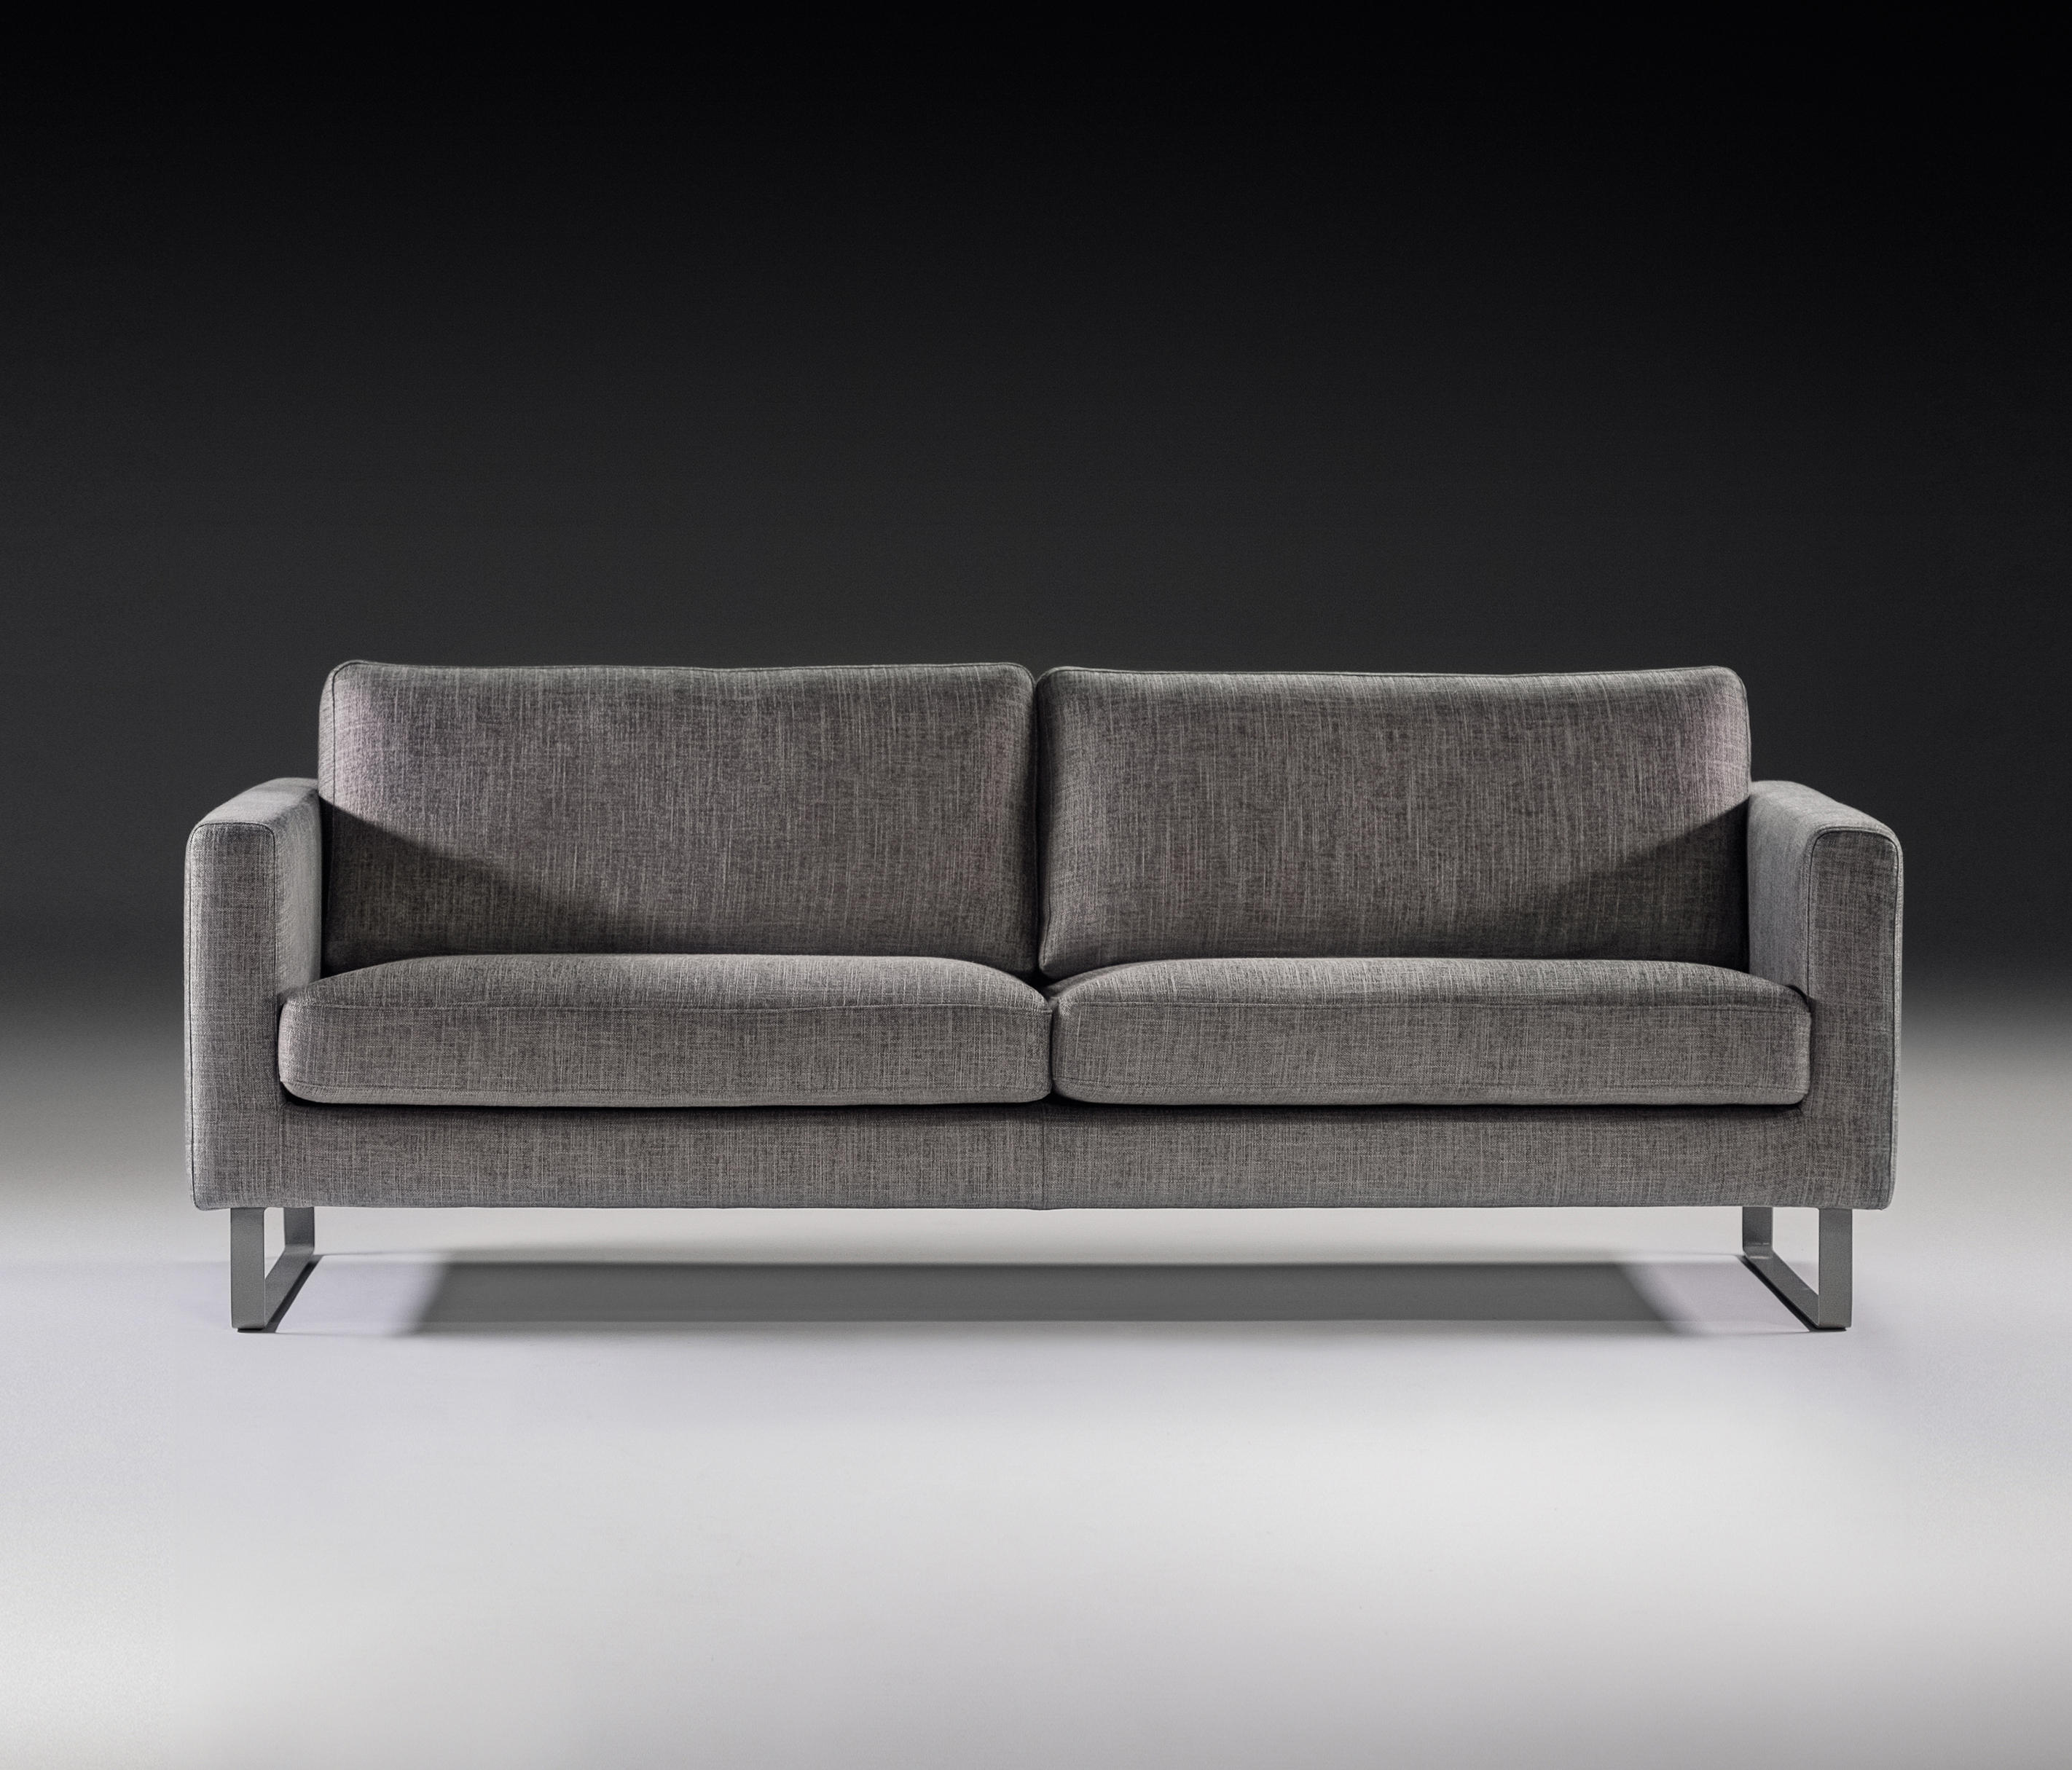 Elegance sofa home decor 88 for Prostoria divani